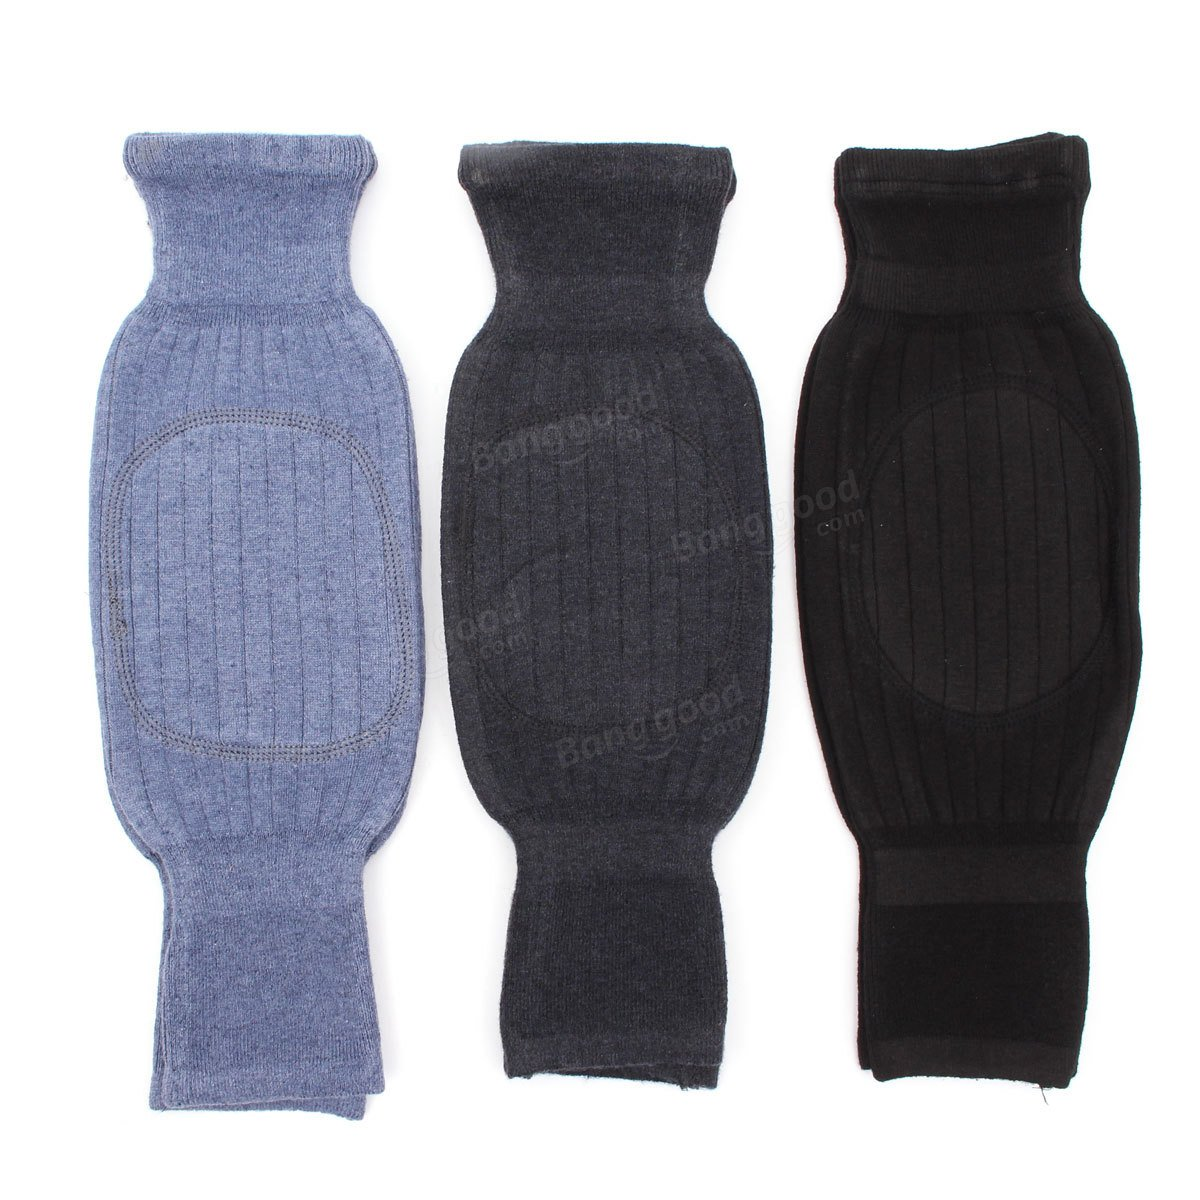 Genu Heater - Winter Woman Fitness Thigh Knee Care Warmer Protector - Articulatio - 1PCs